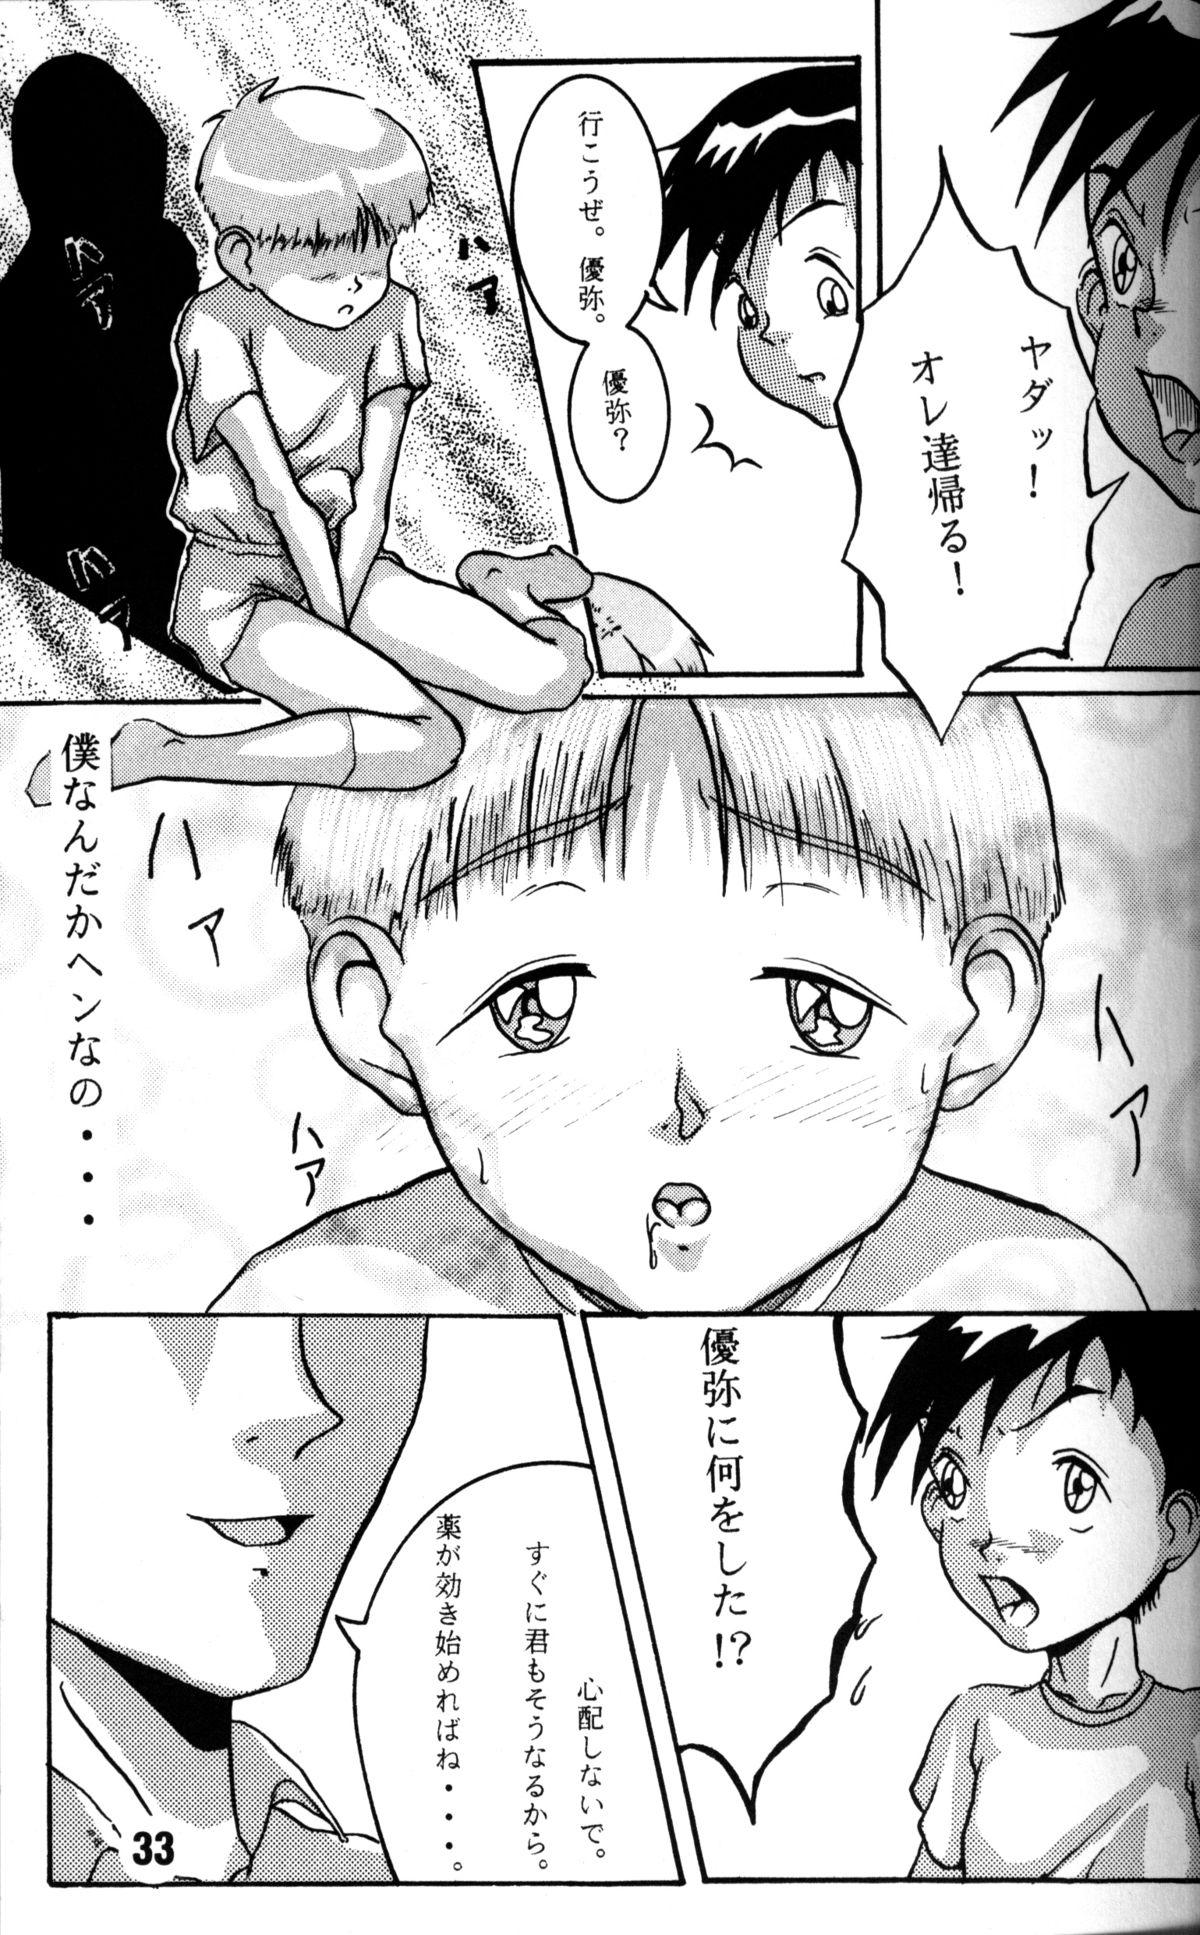 Anthology - Nekketsu Project - Volume 4 'Shounen Vanilla Essence' 31